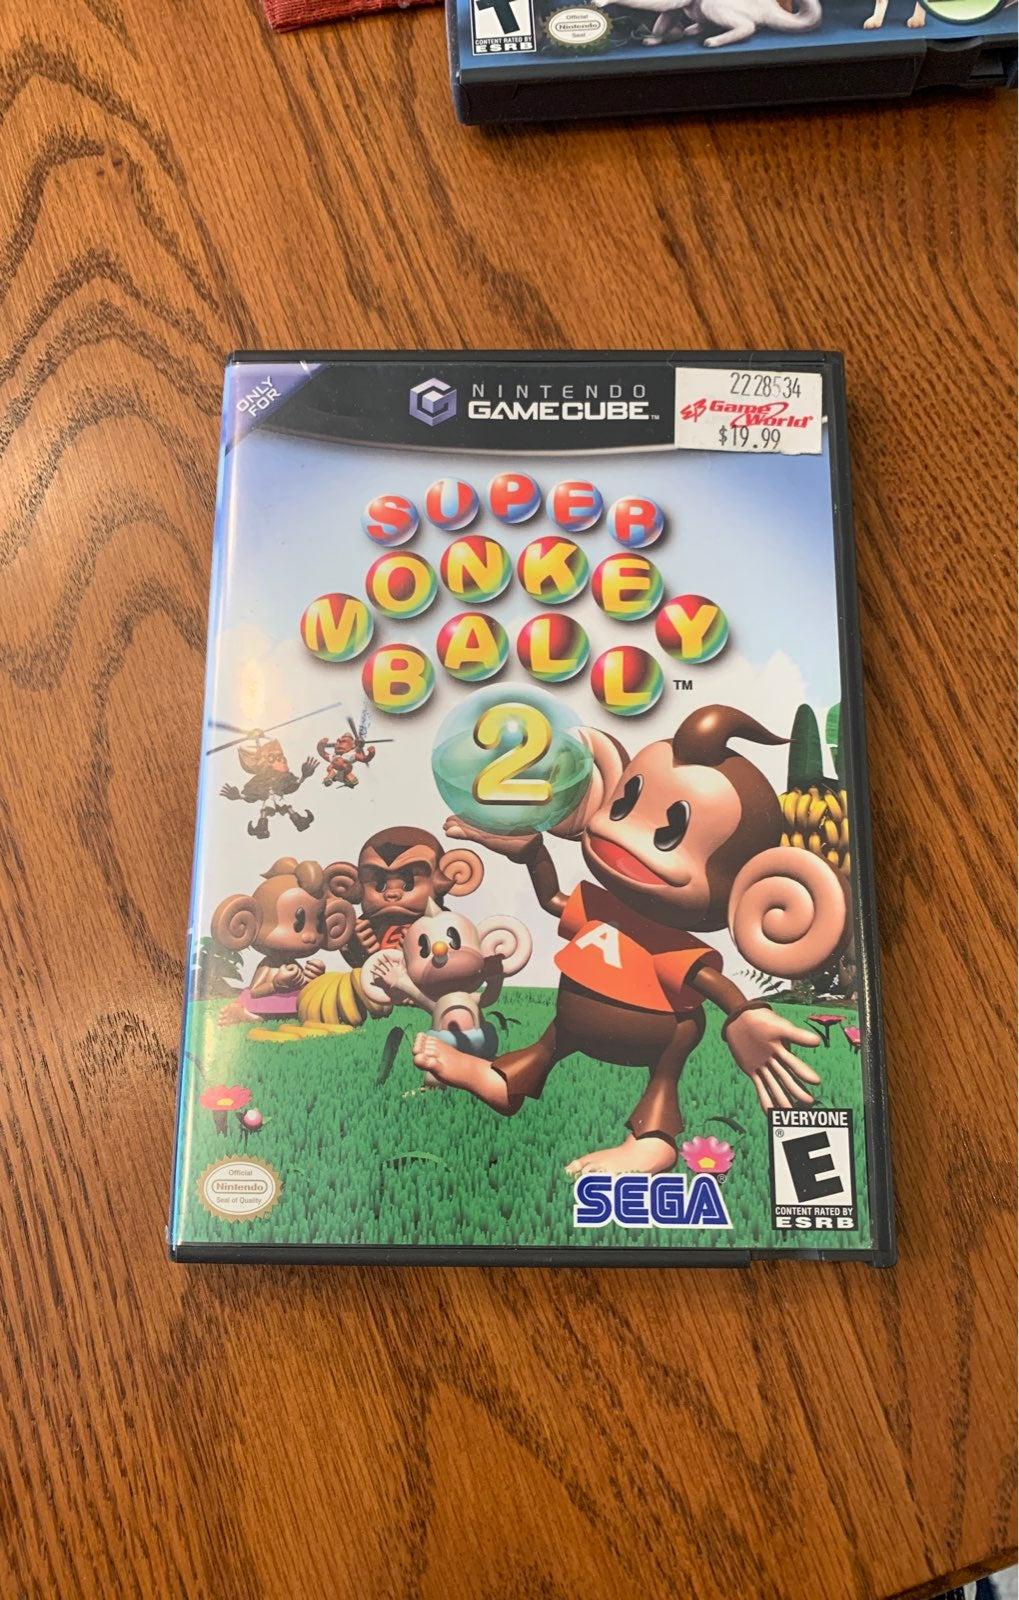 Super Monkey Ball 2 on Nintendo GameCube